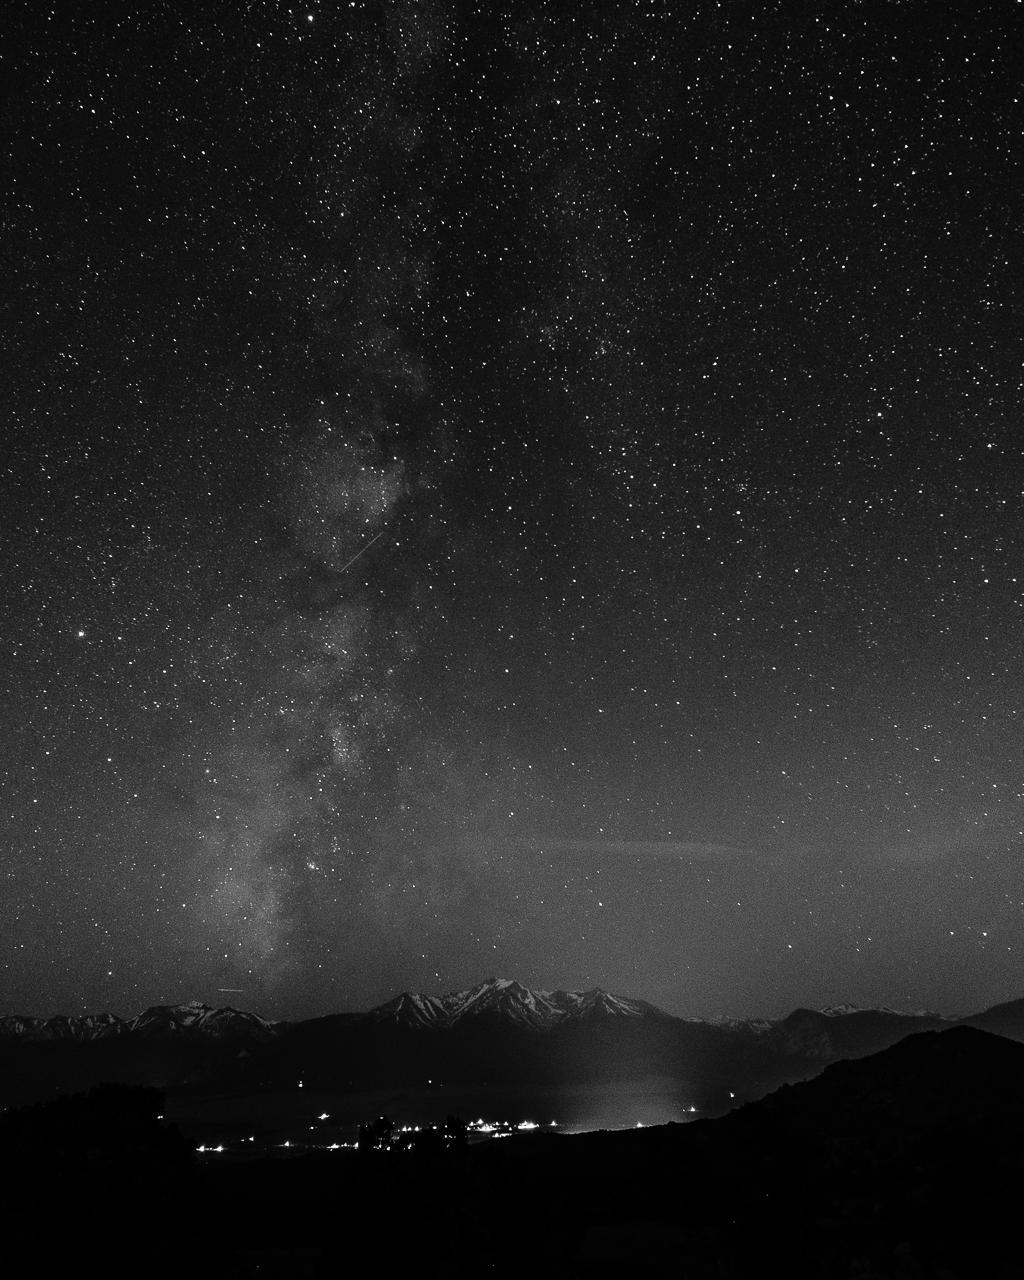 Milky Way over the Collegiate Peaks